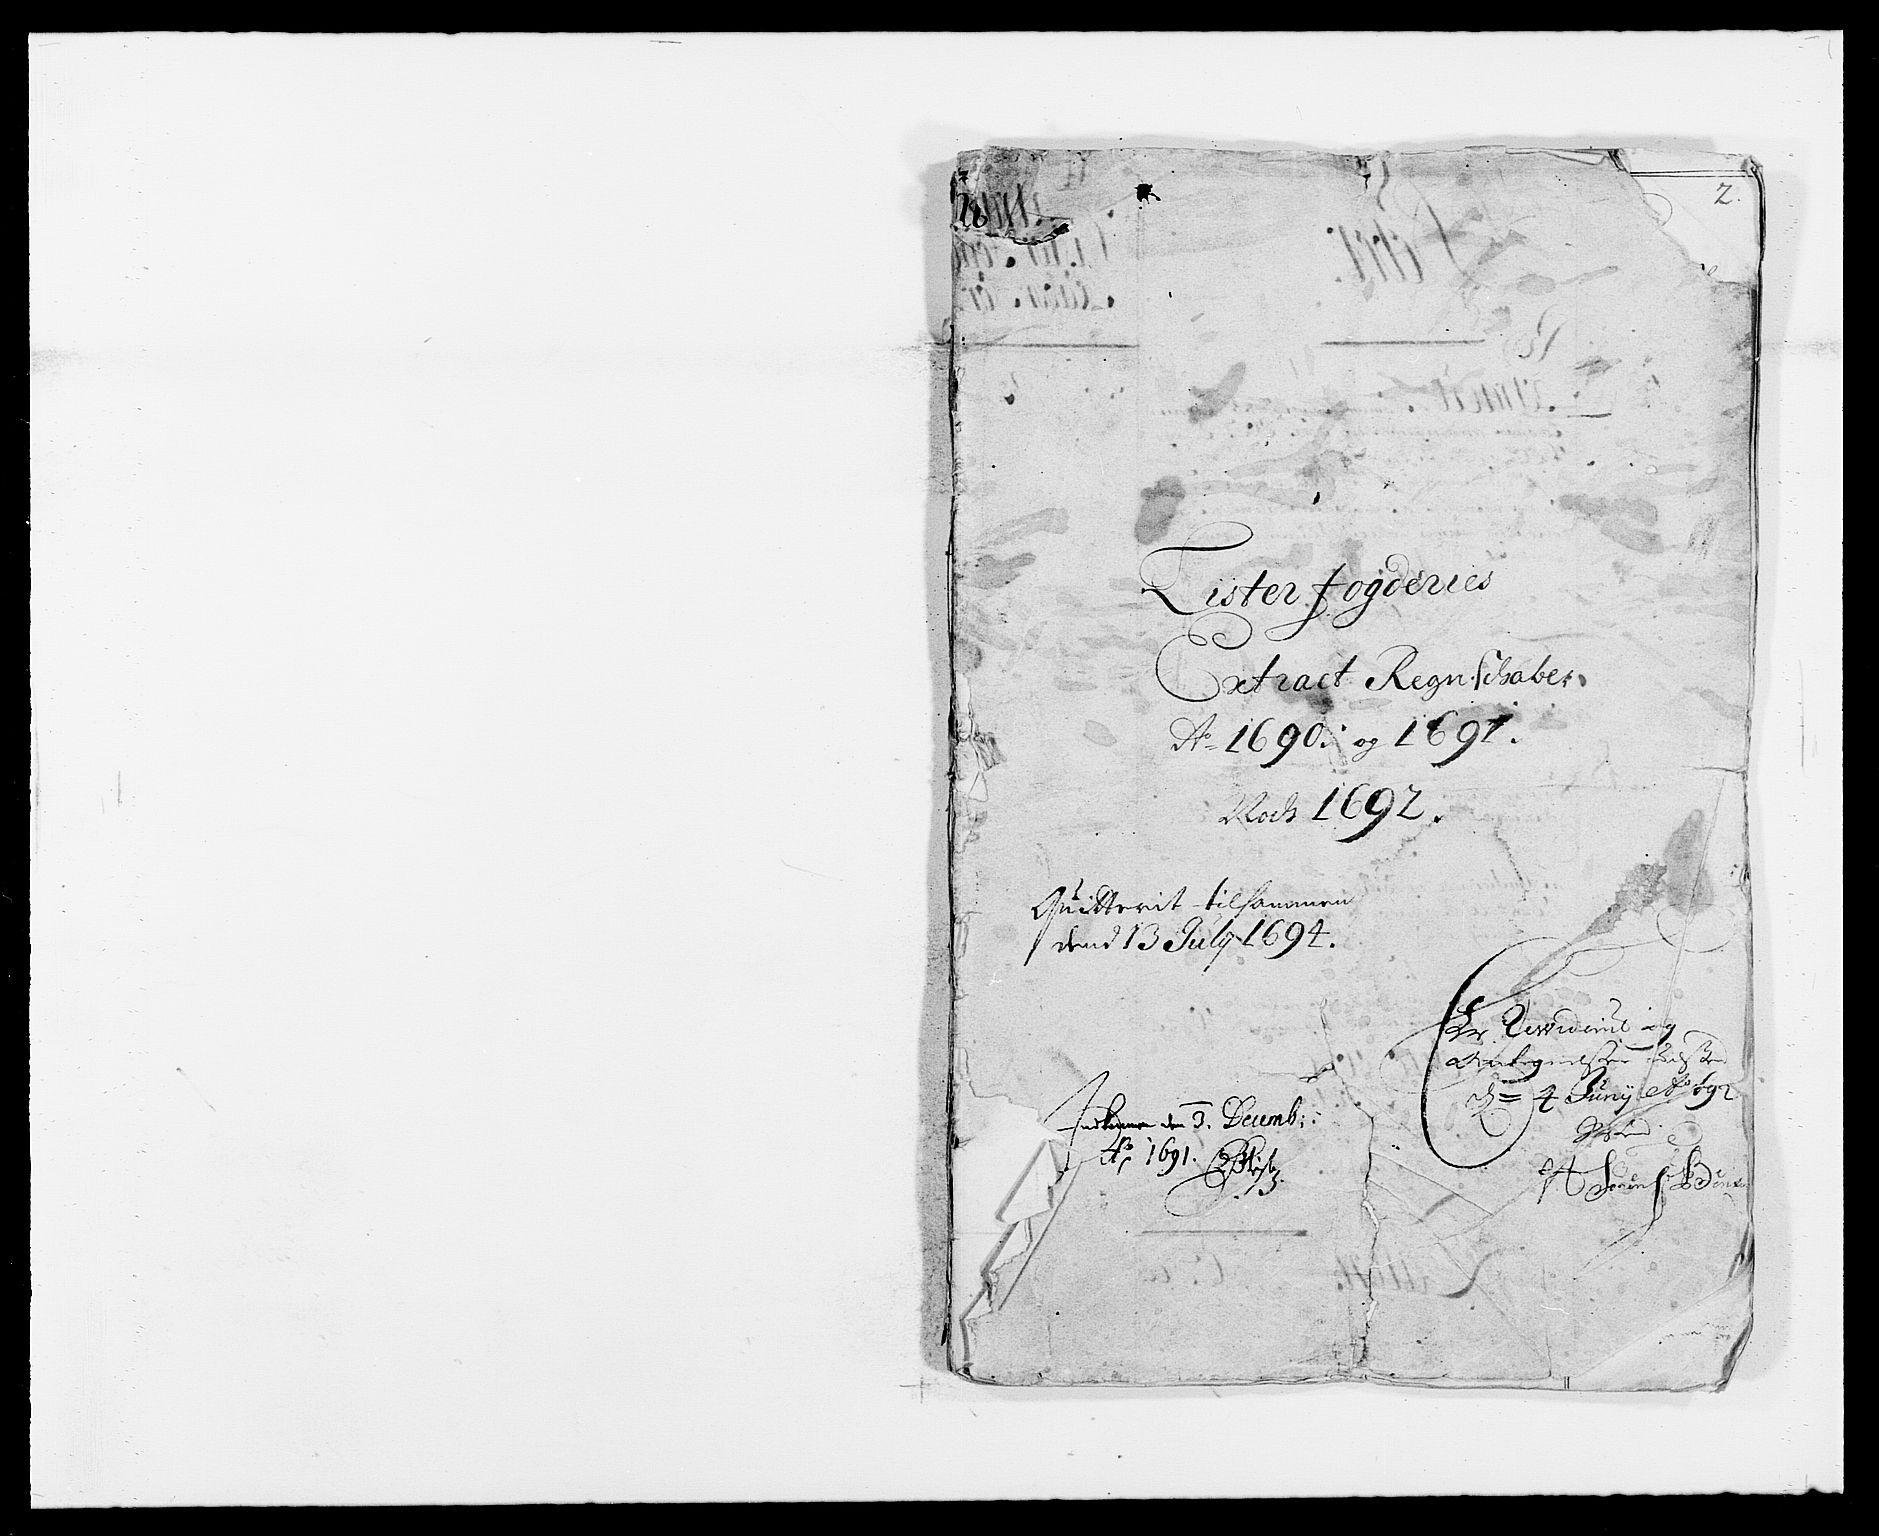 RA, Rentekammeret inntil 1814, Reviderte regnskaper, Fogderegnskap, R41/L2536: Fogderegnskap Lista, 1690-1693, s. 1